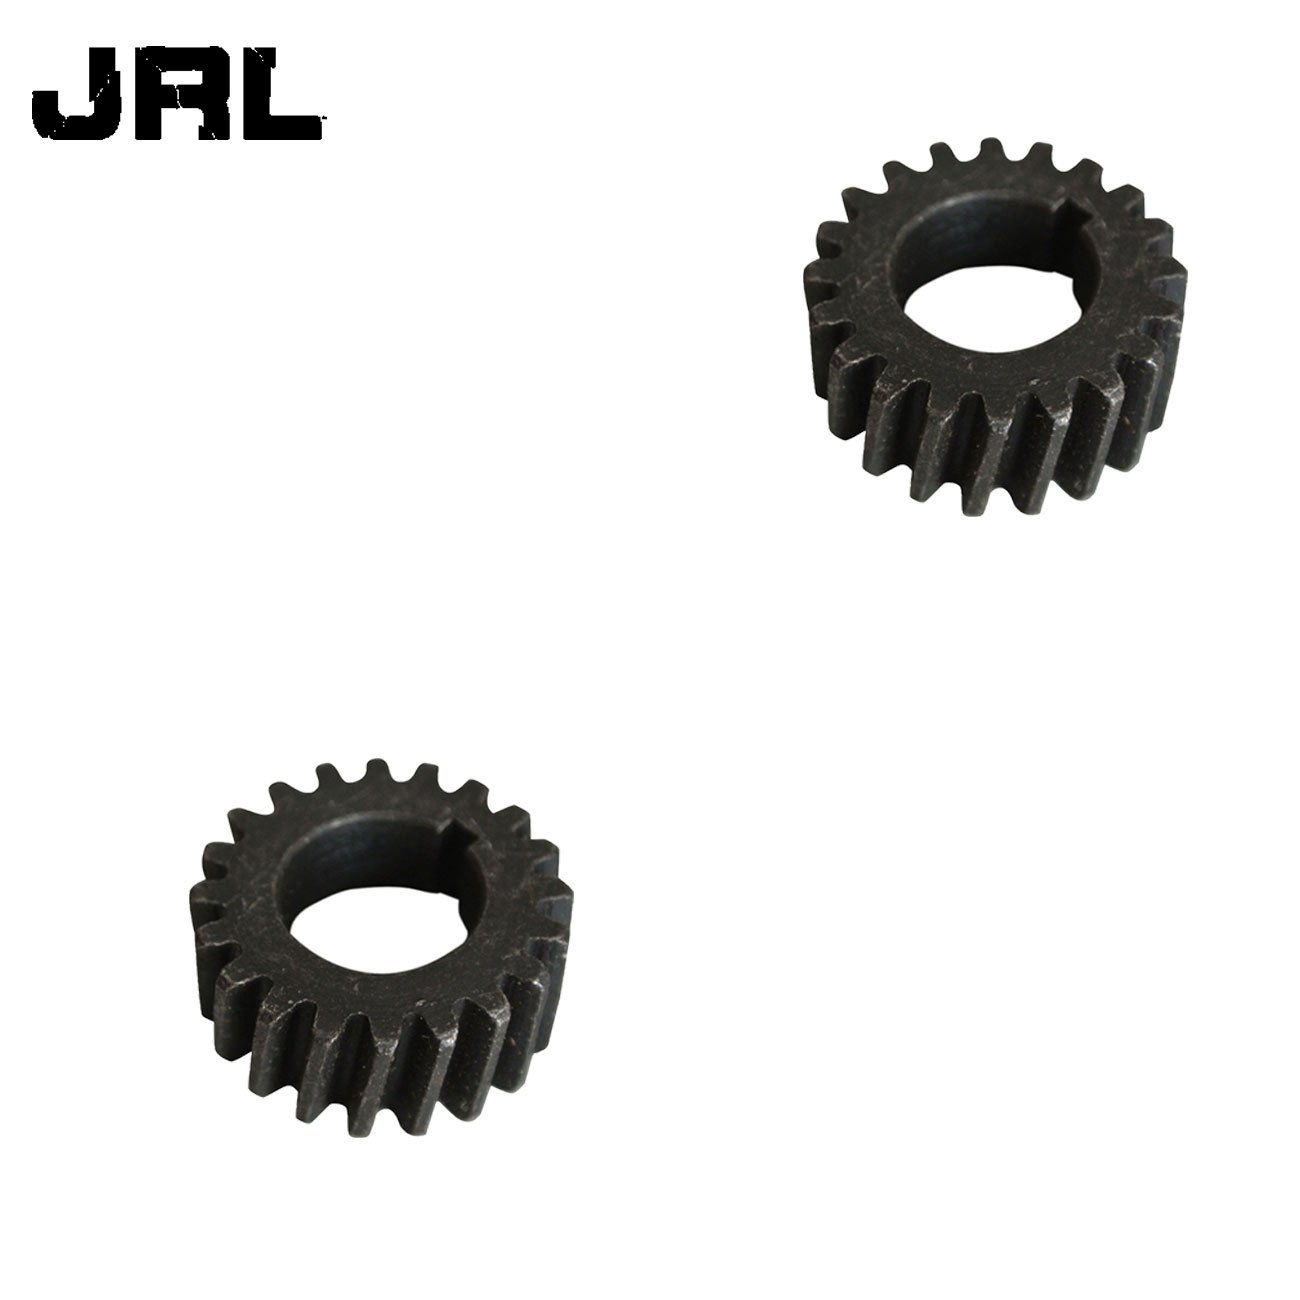 JRL 2pcs Push Bike Gear Flywheel Bevel Pinion Fits 66cc 80cc Motorized Bicycle